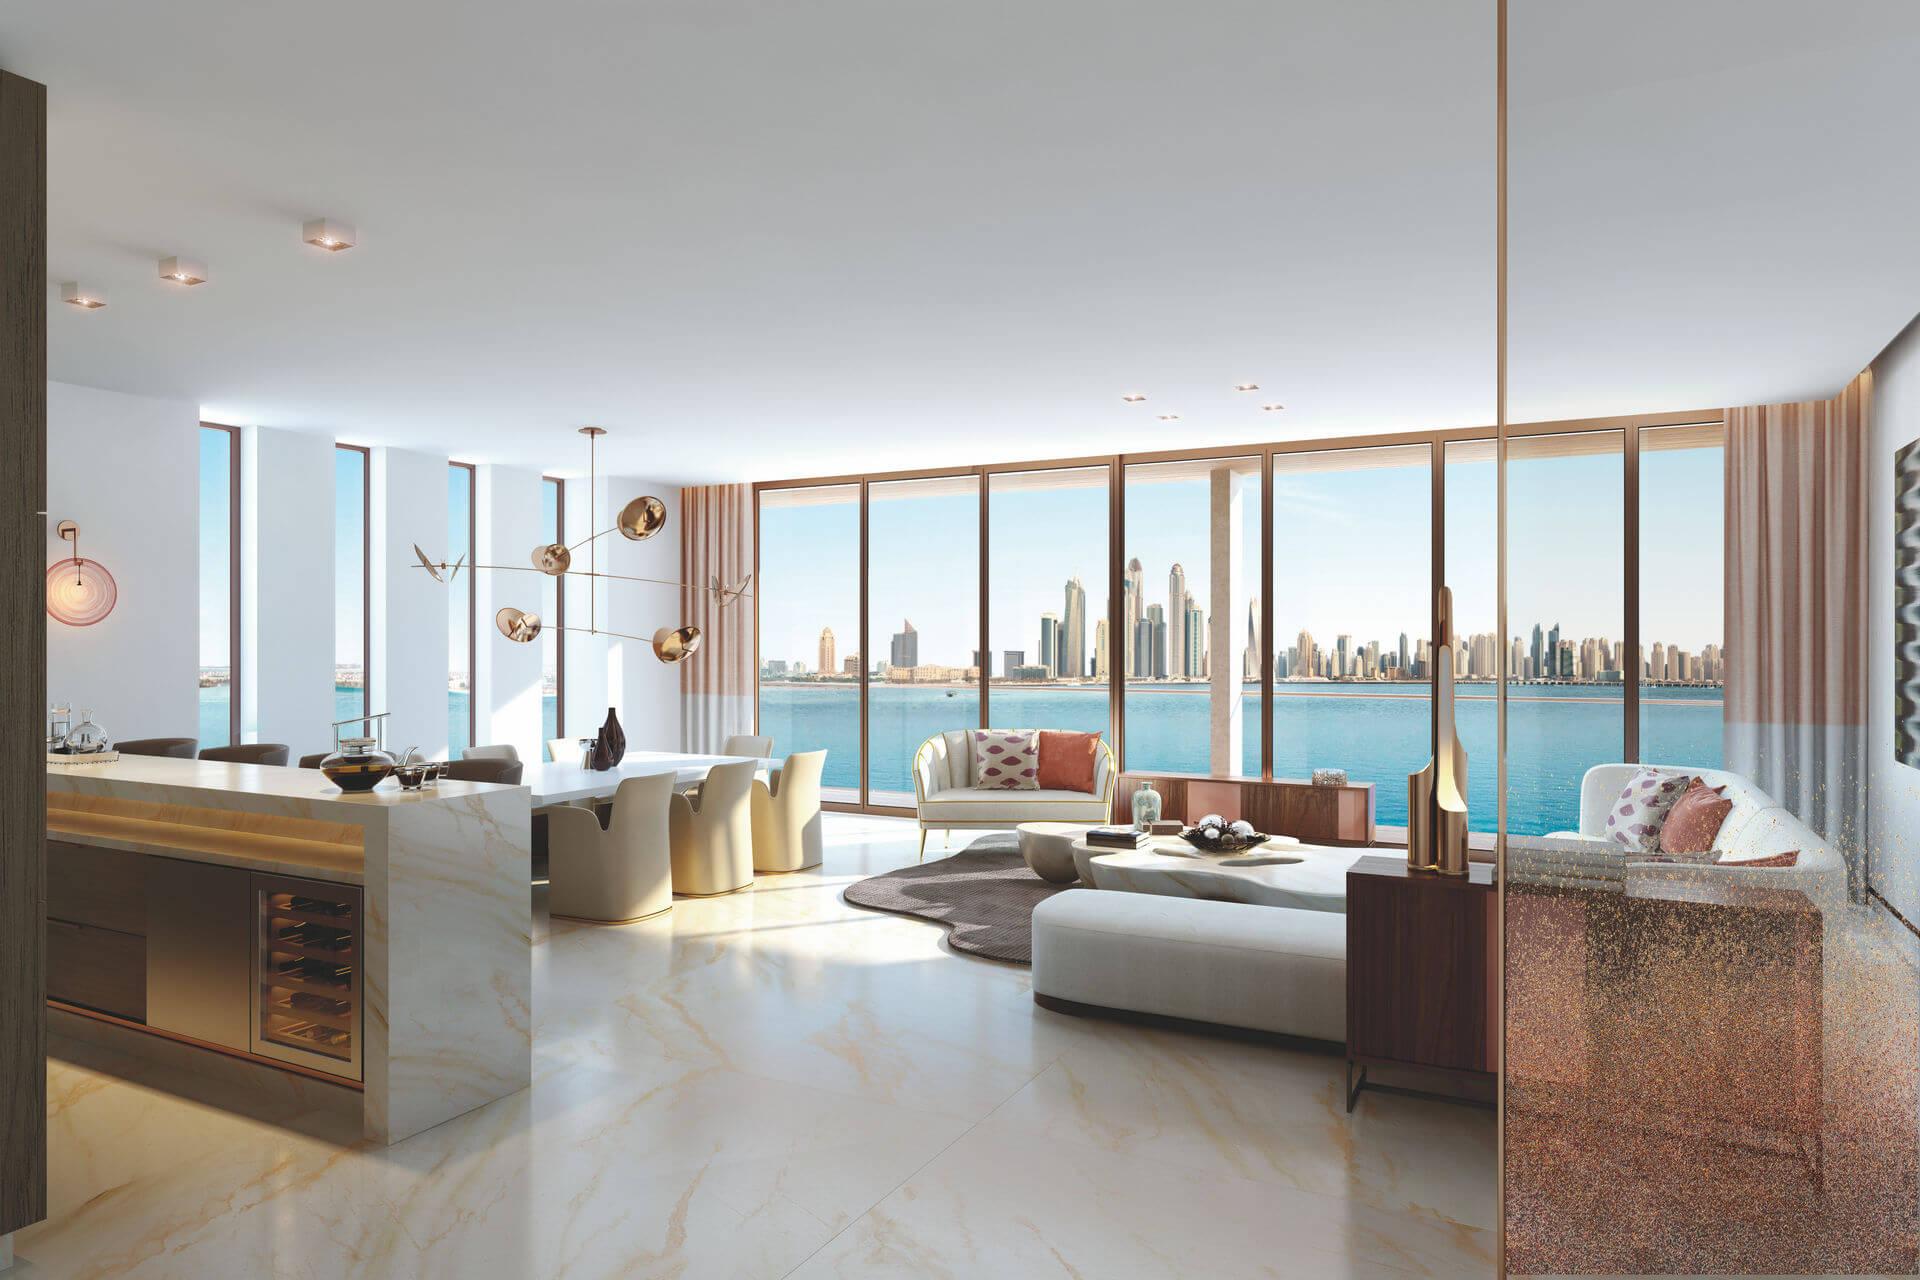 Penthouse for sale in Dubai, UAE, 5 bedrooms, 1531 m2, No. 23843 – photo 9